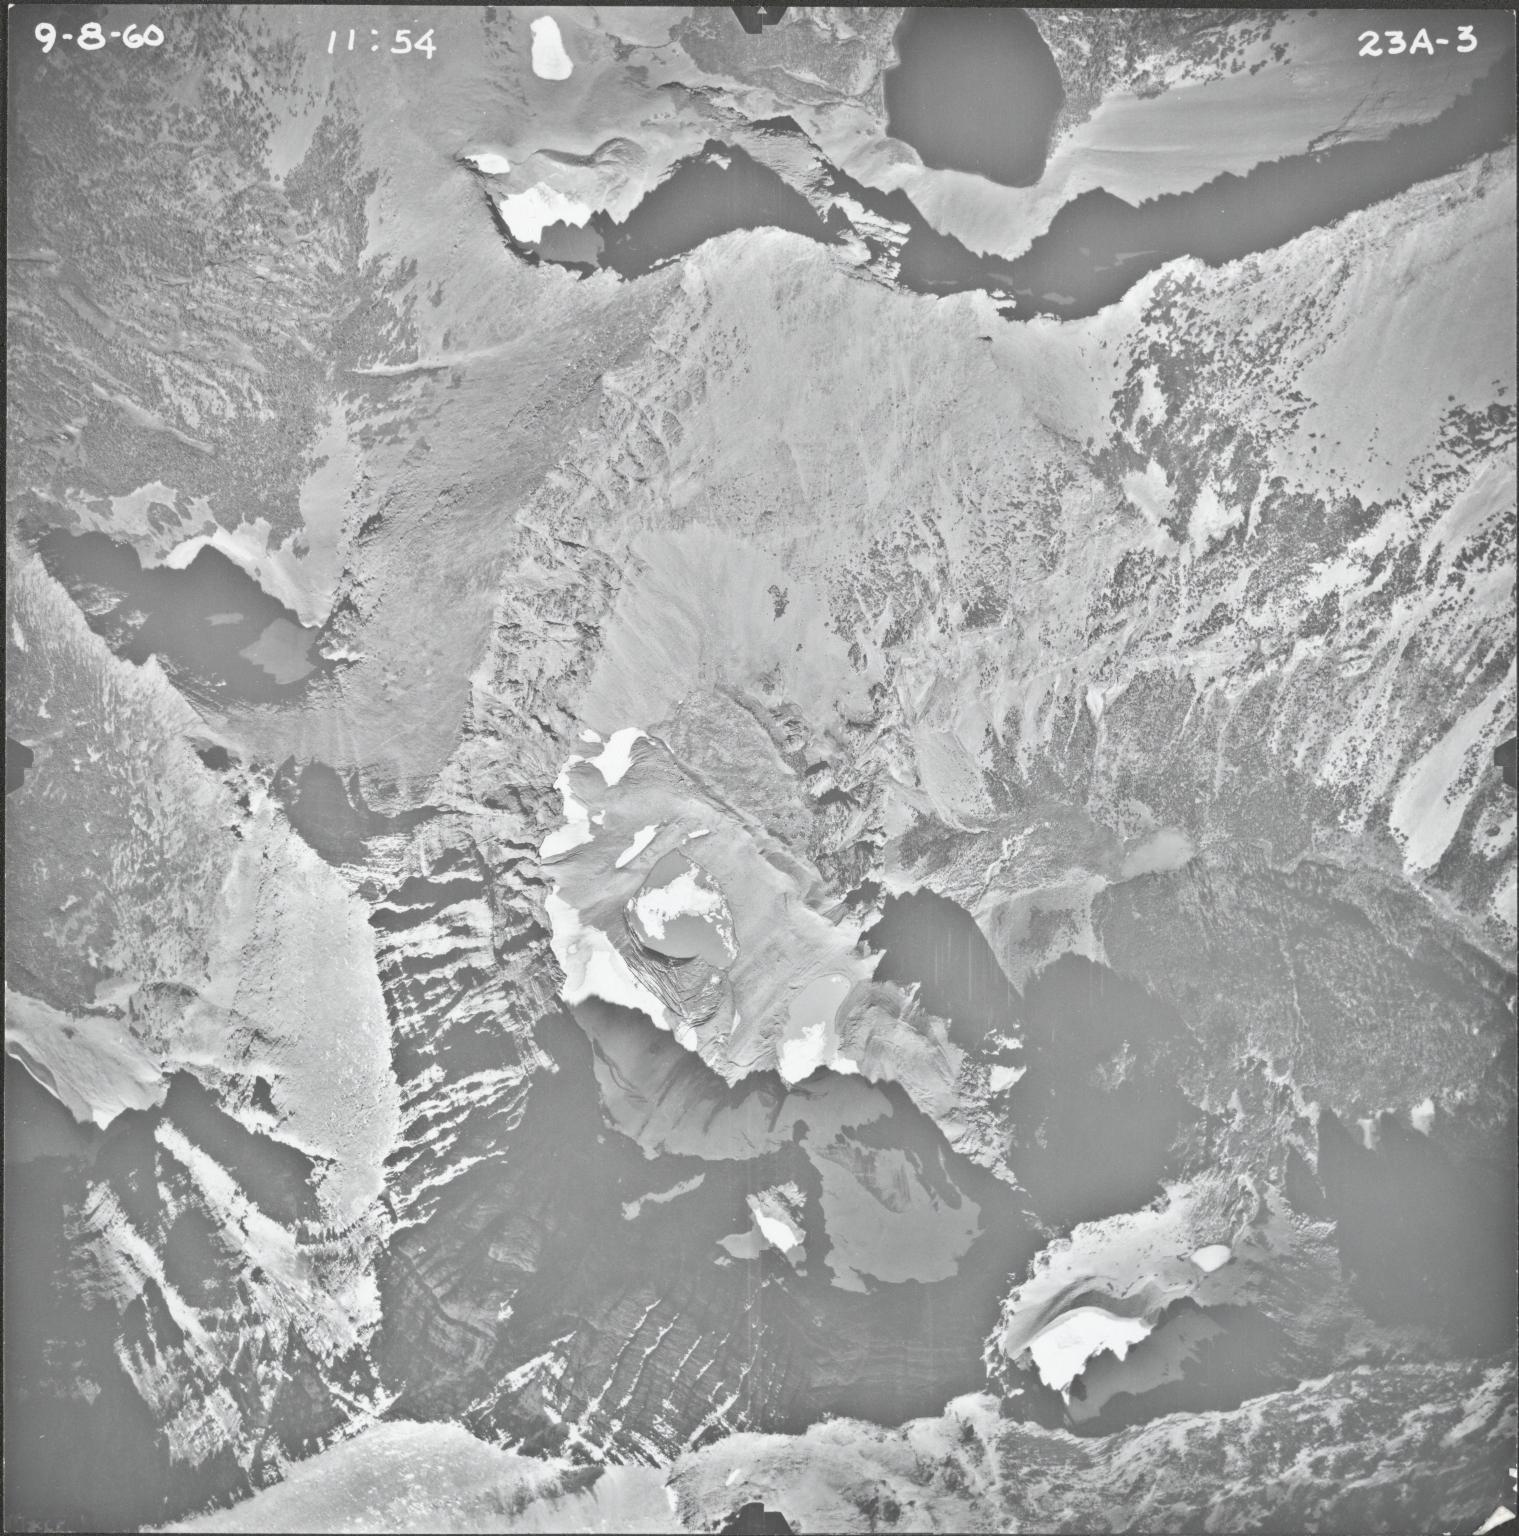 Mount James, aerial photograph 23A-3, Montana